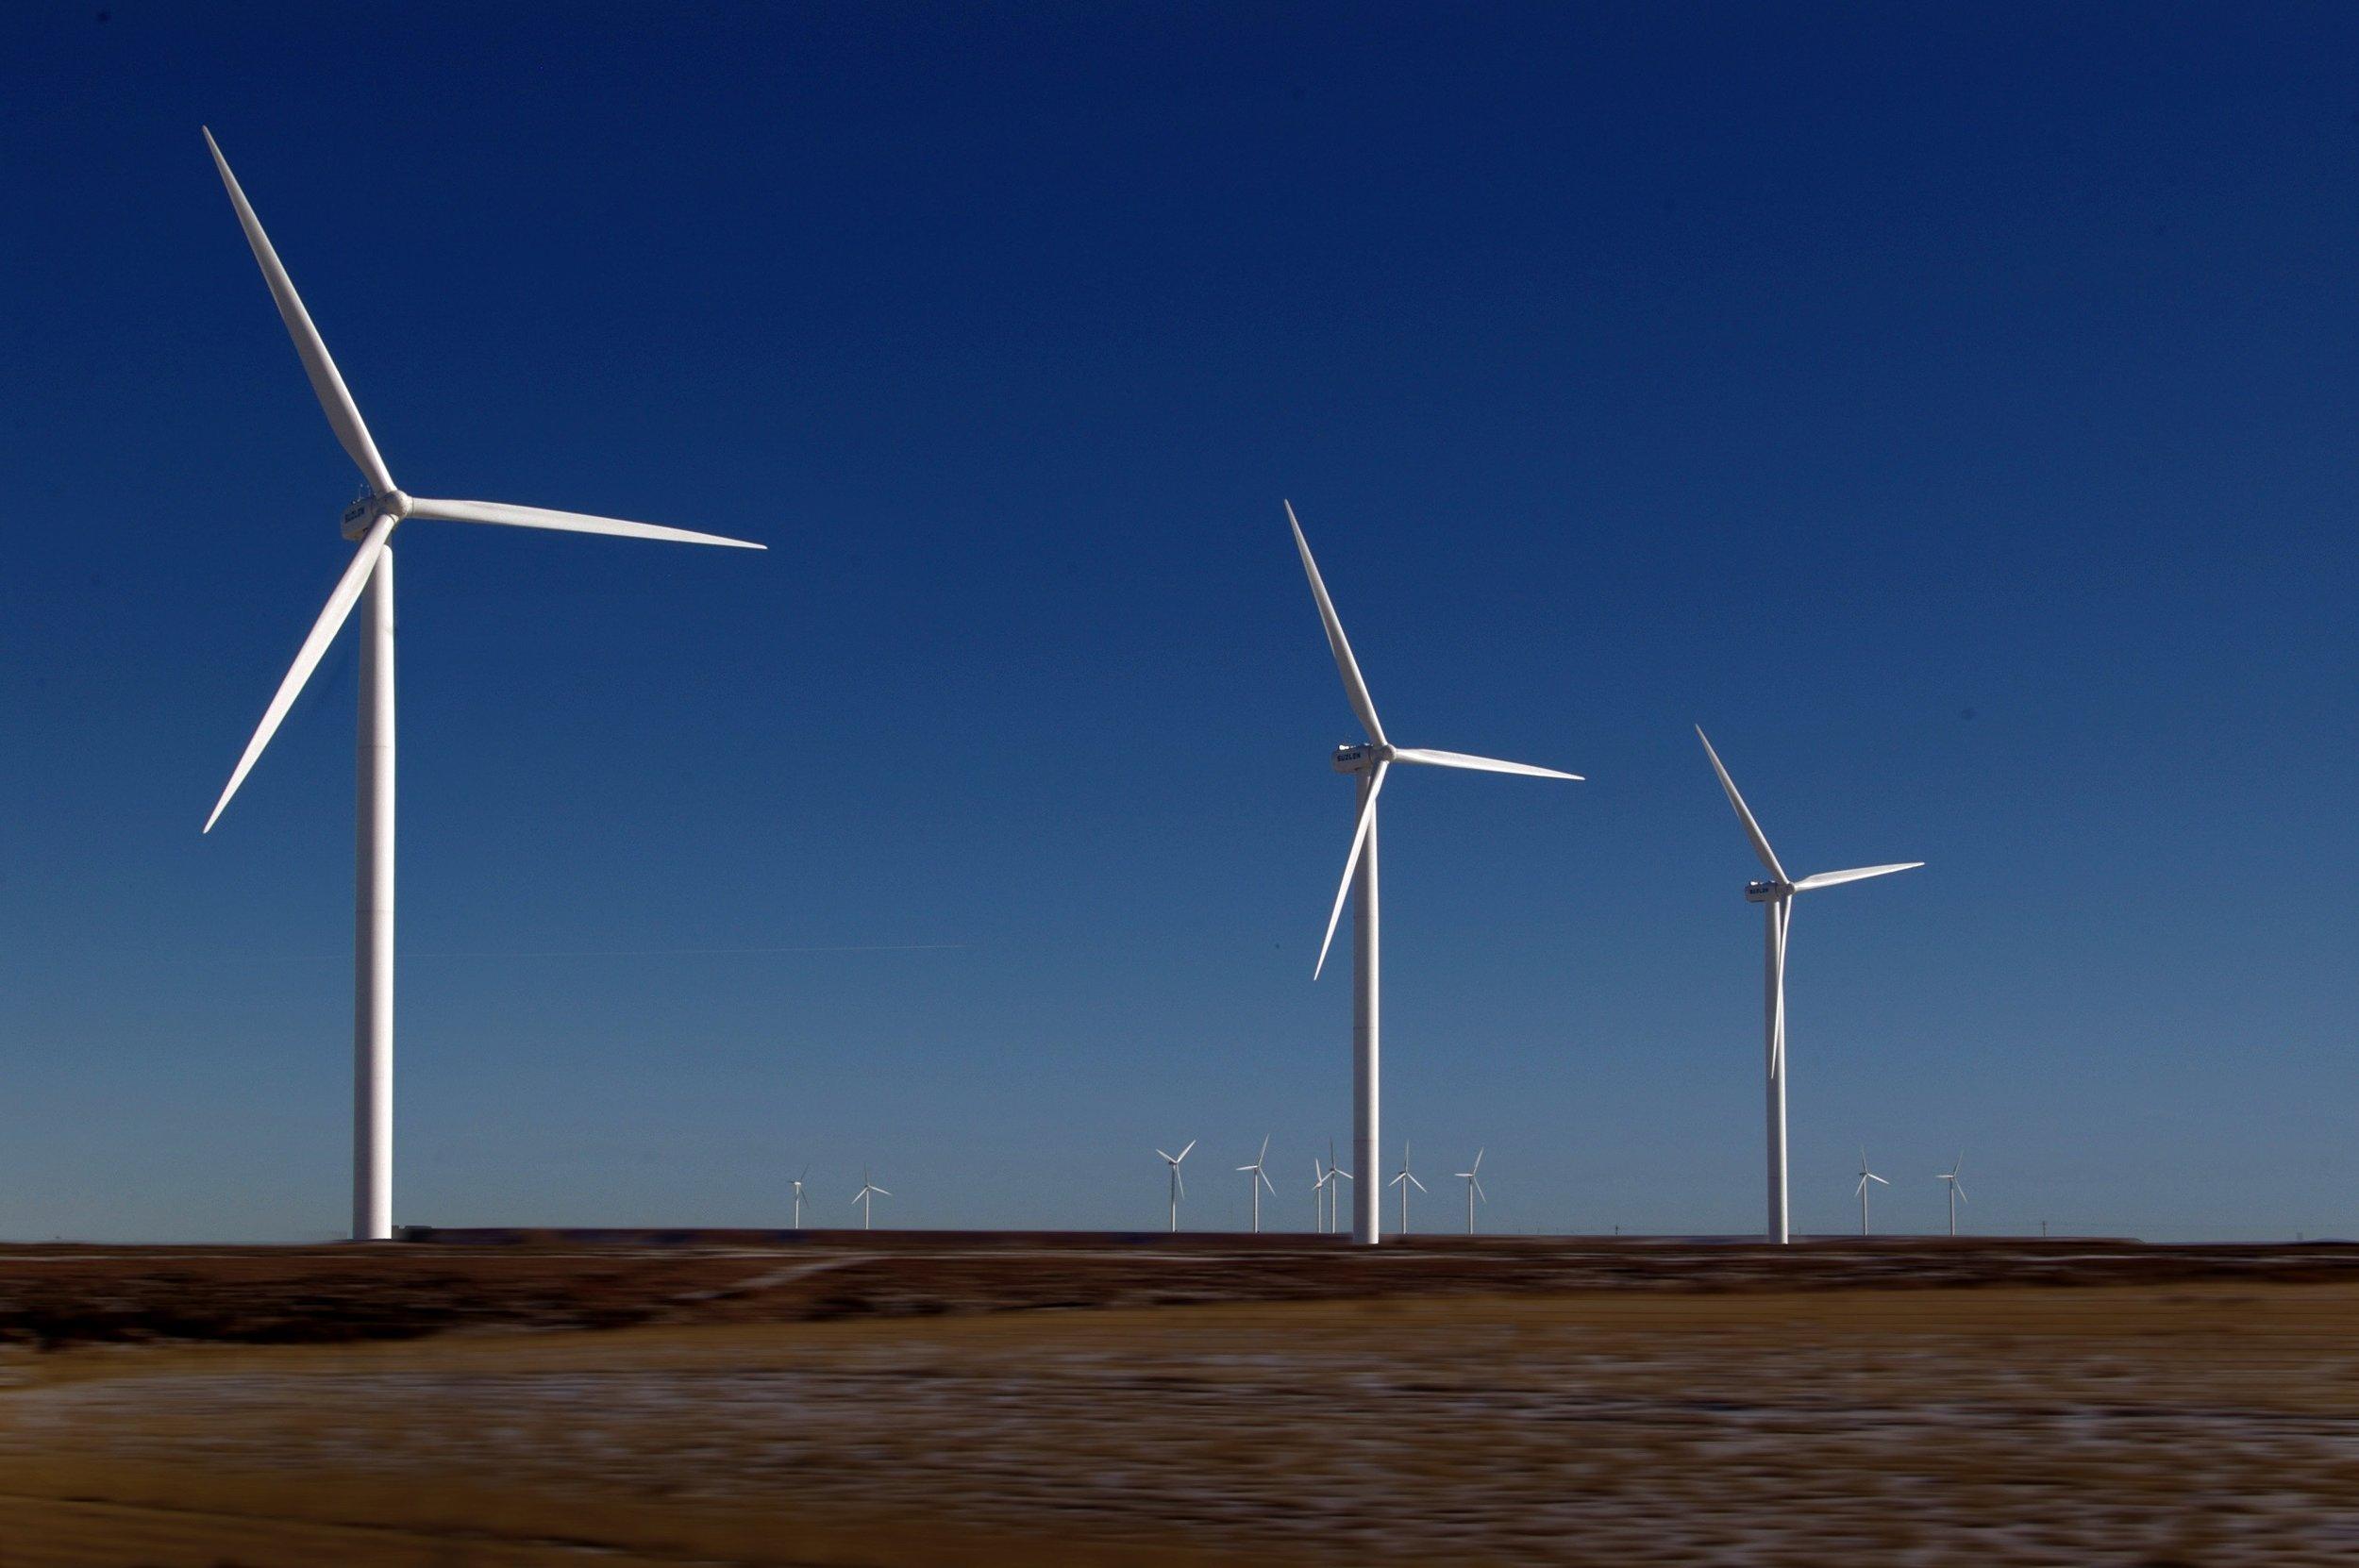 wind power, turbines, alternative fuels, renewable energy